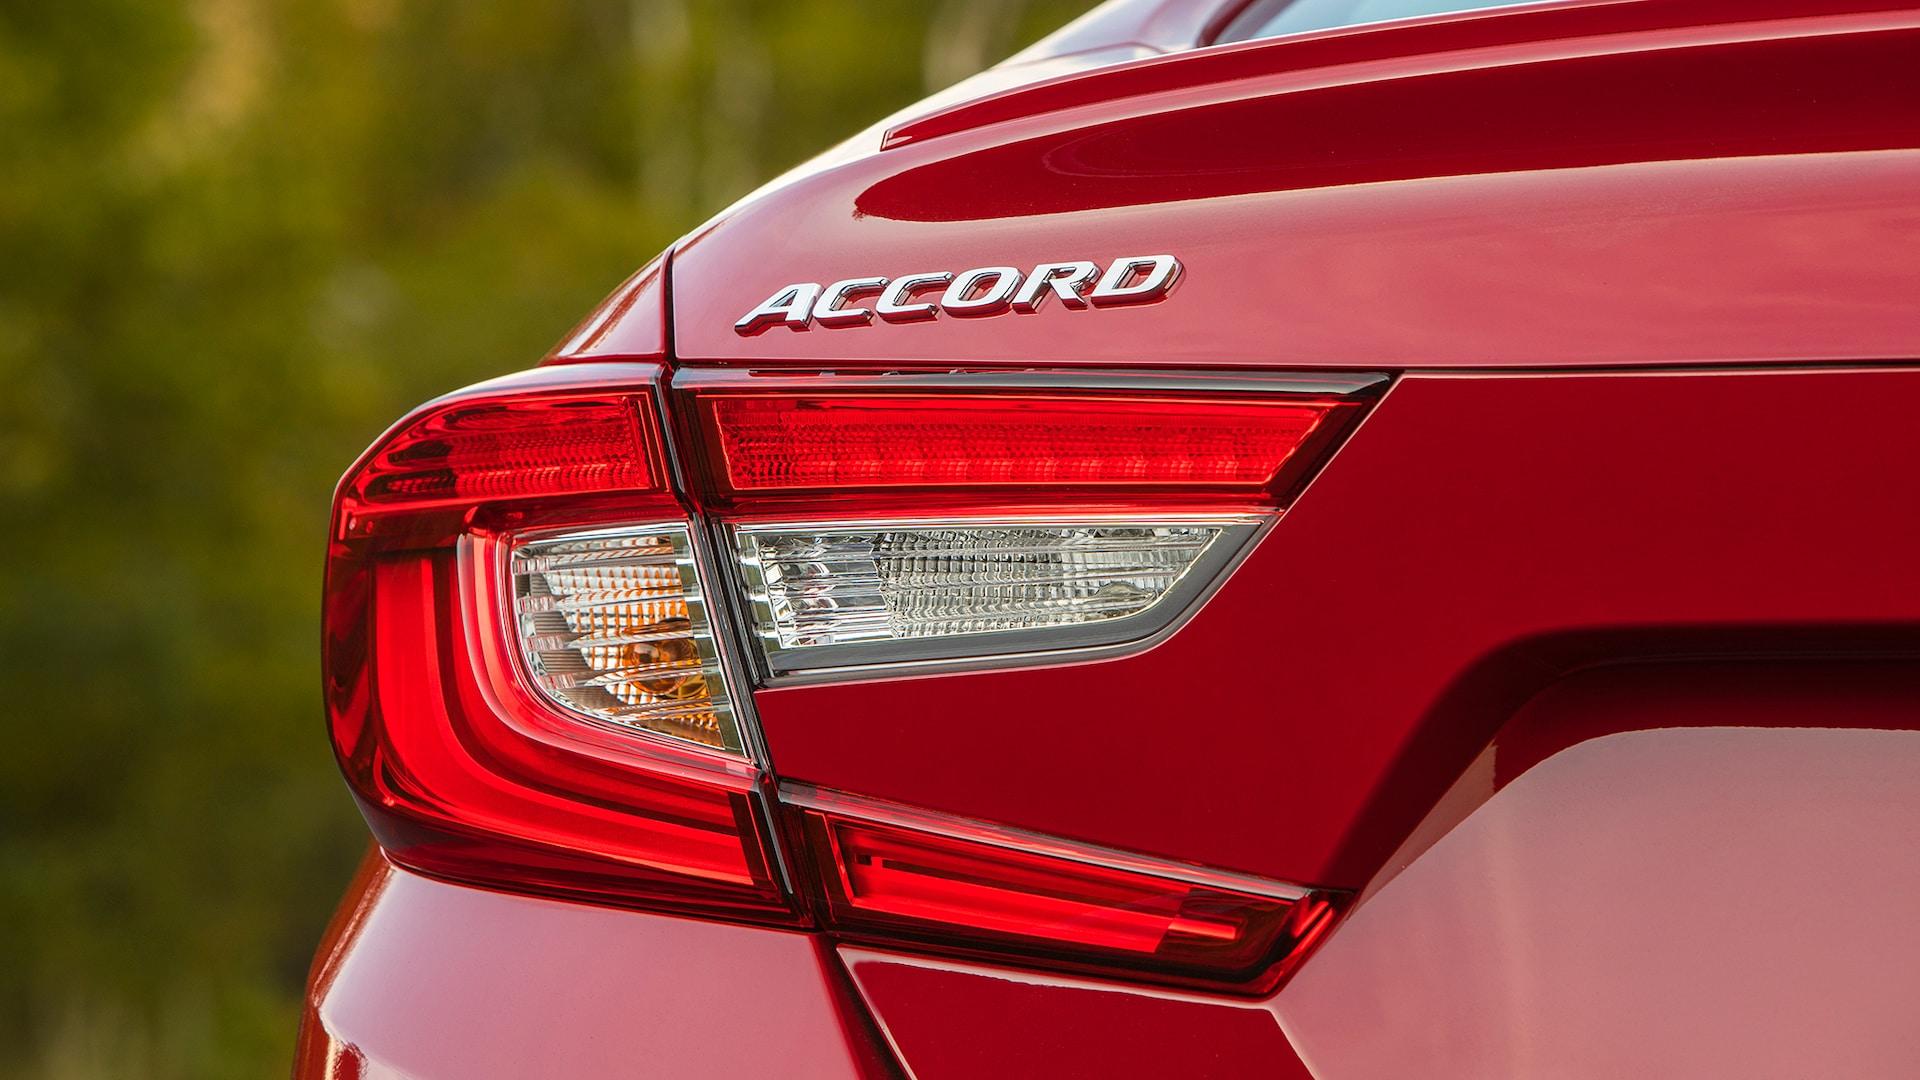 2020 honda accord trim guide what